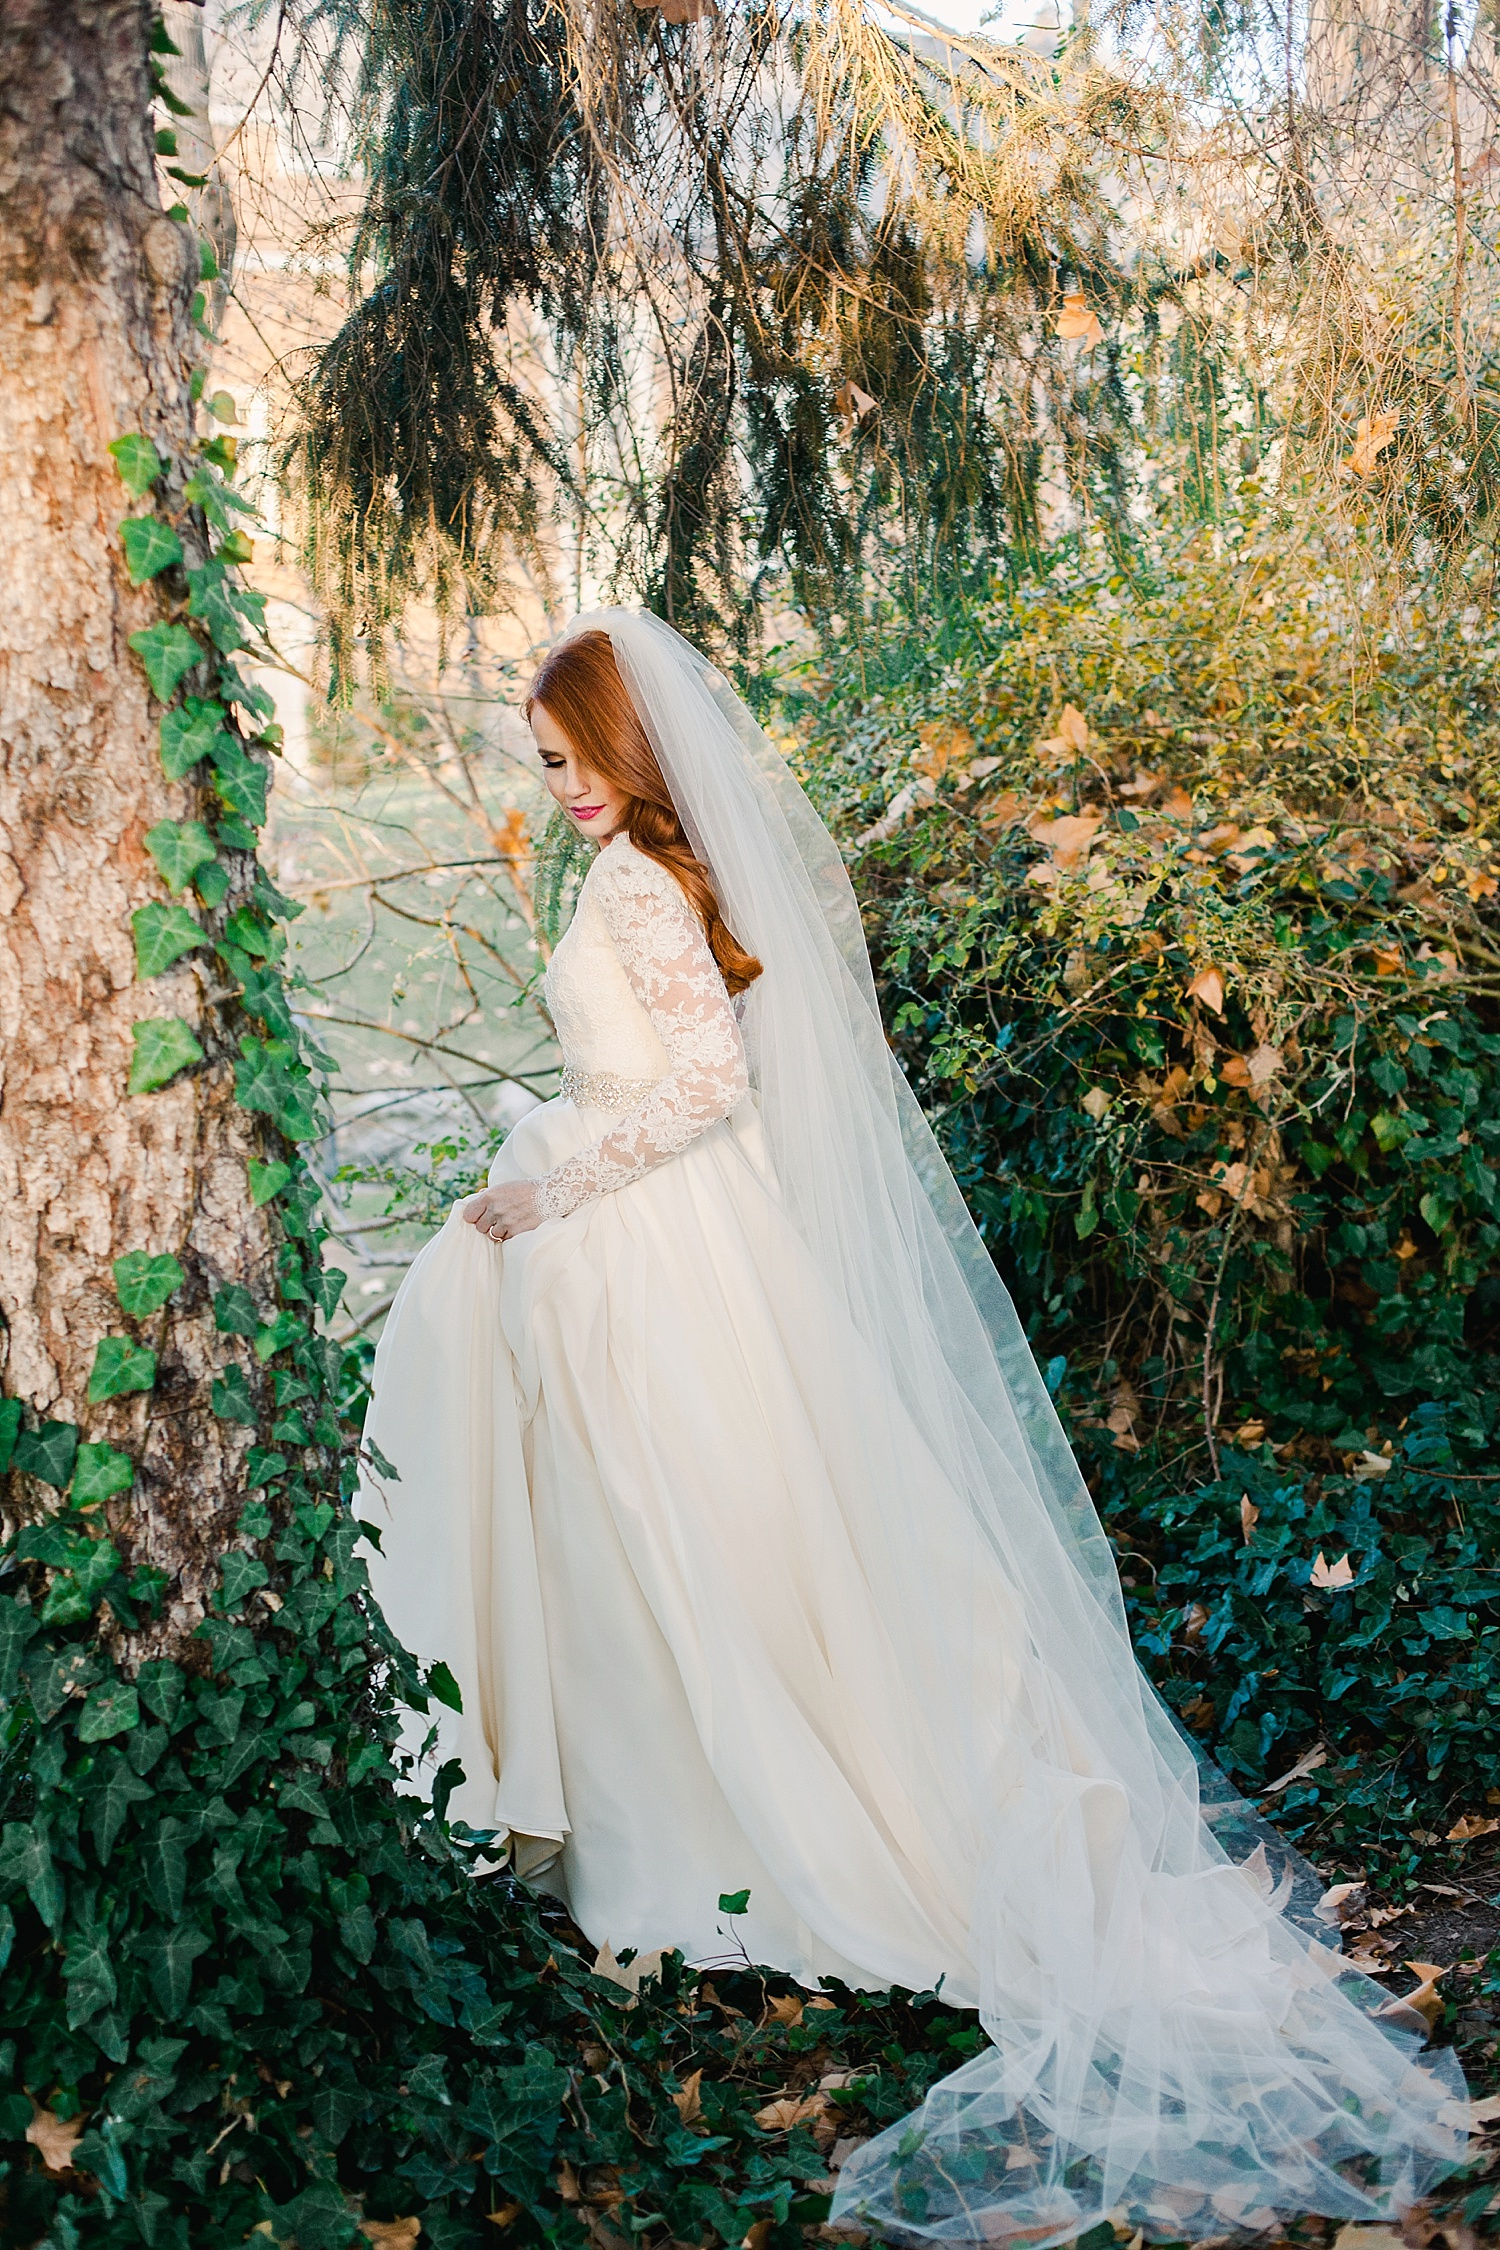 utah-bridal-portraits-0011.jpg